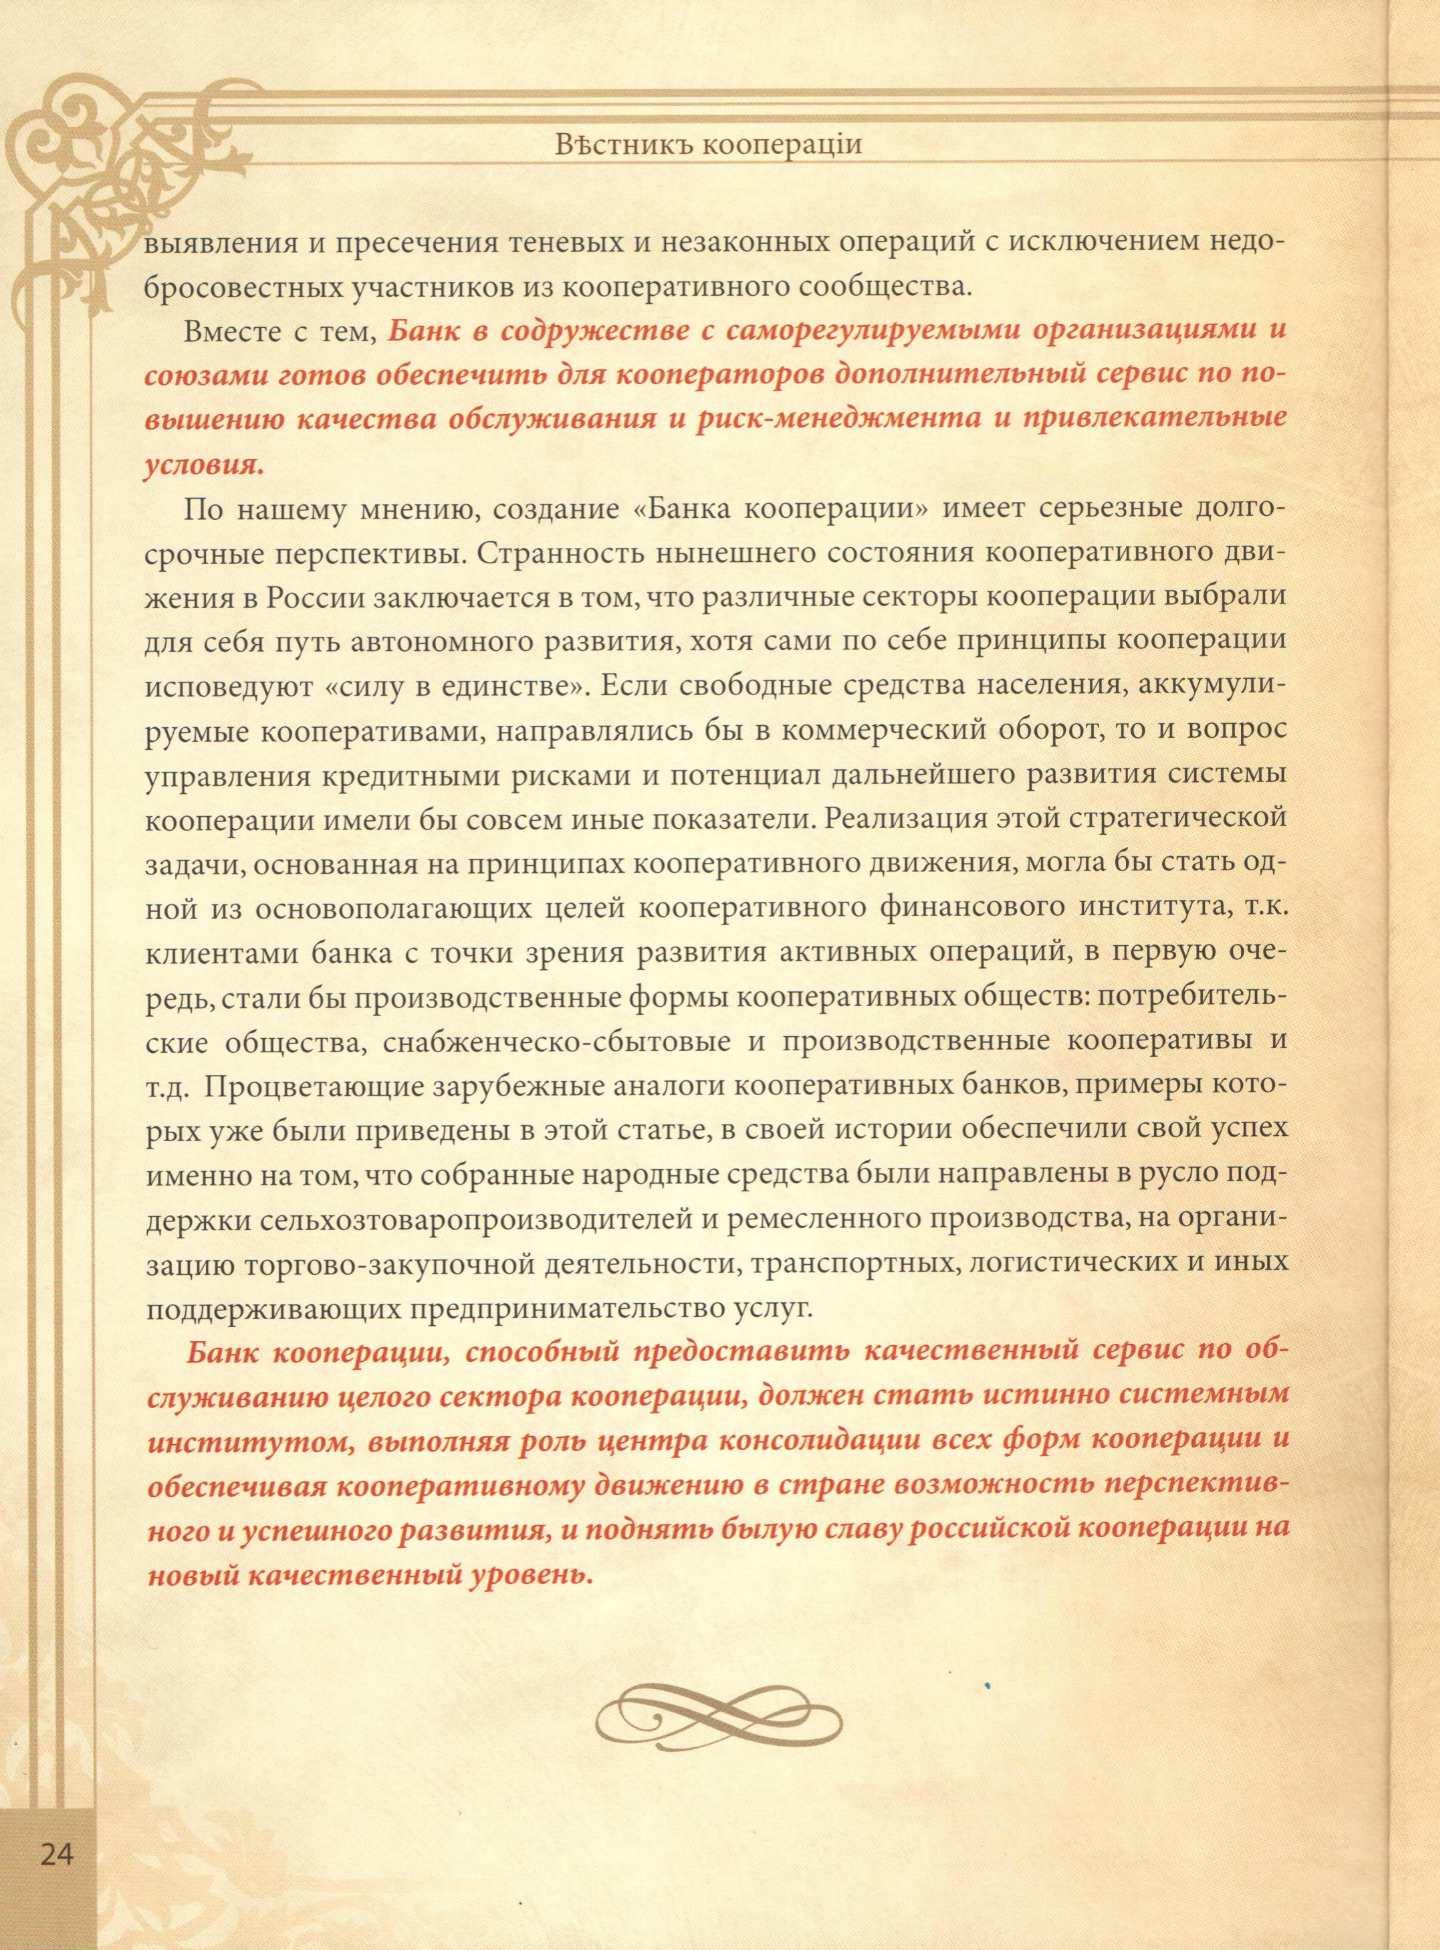 Вестник кооперации-24